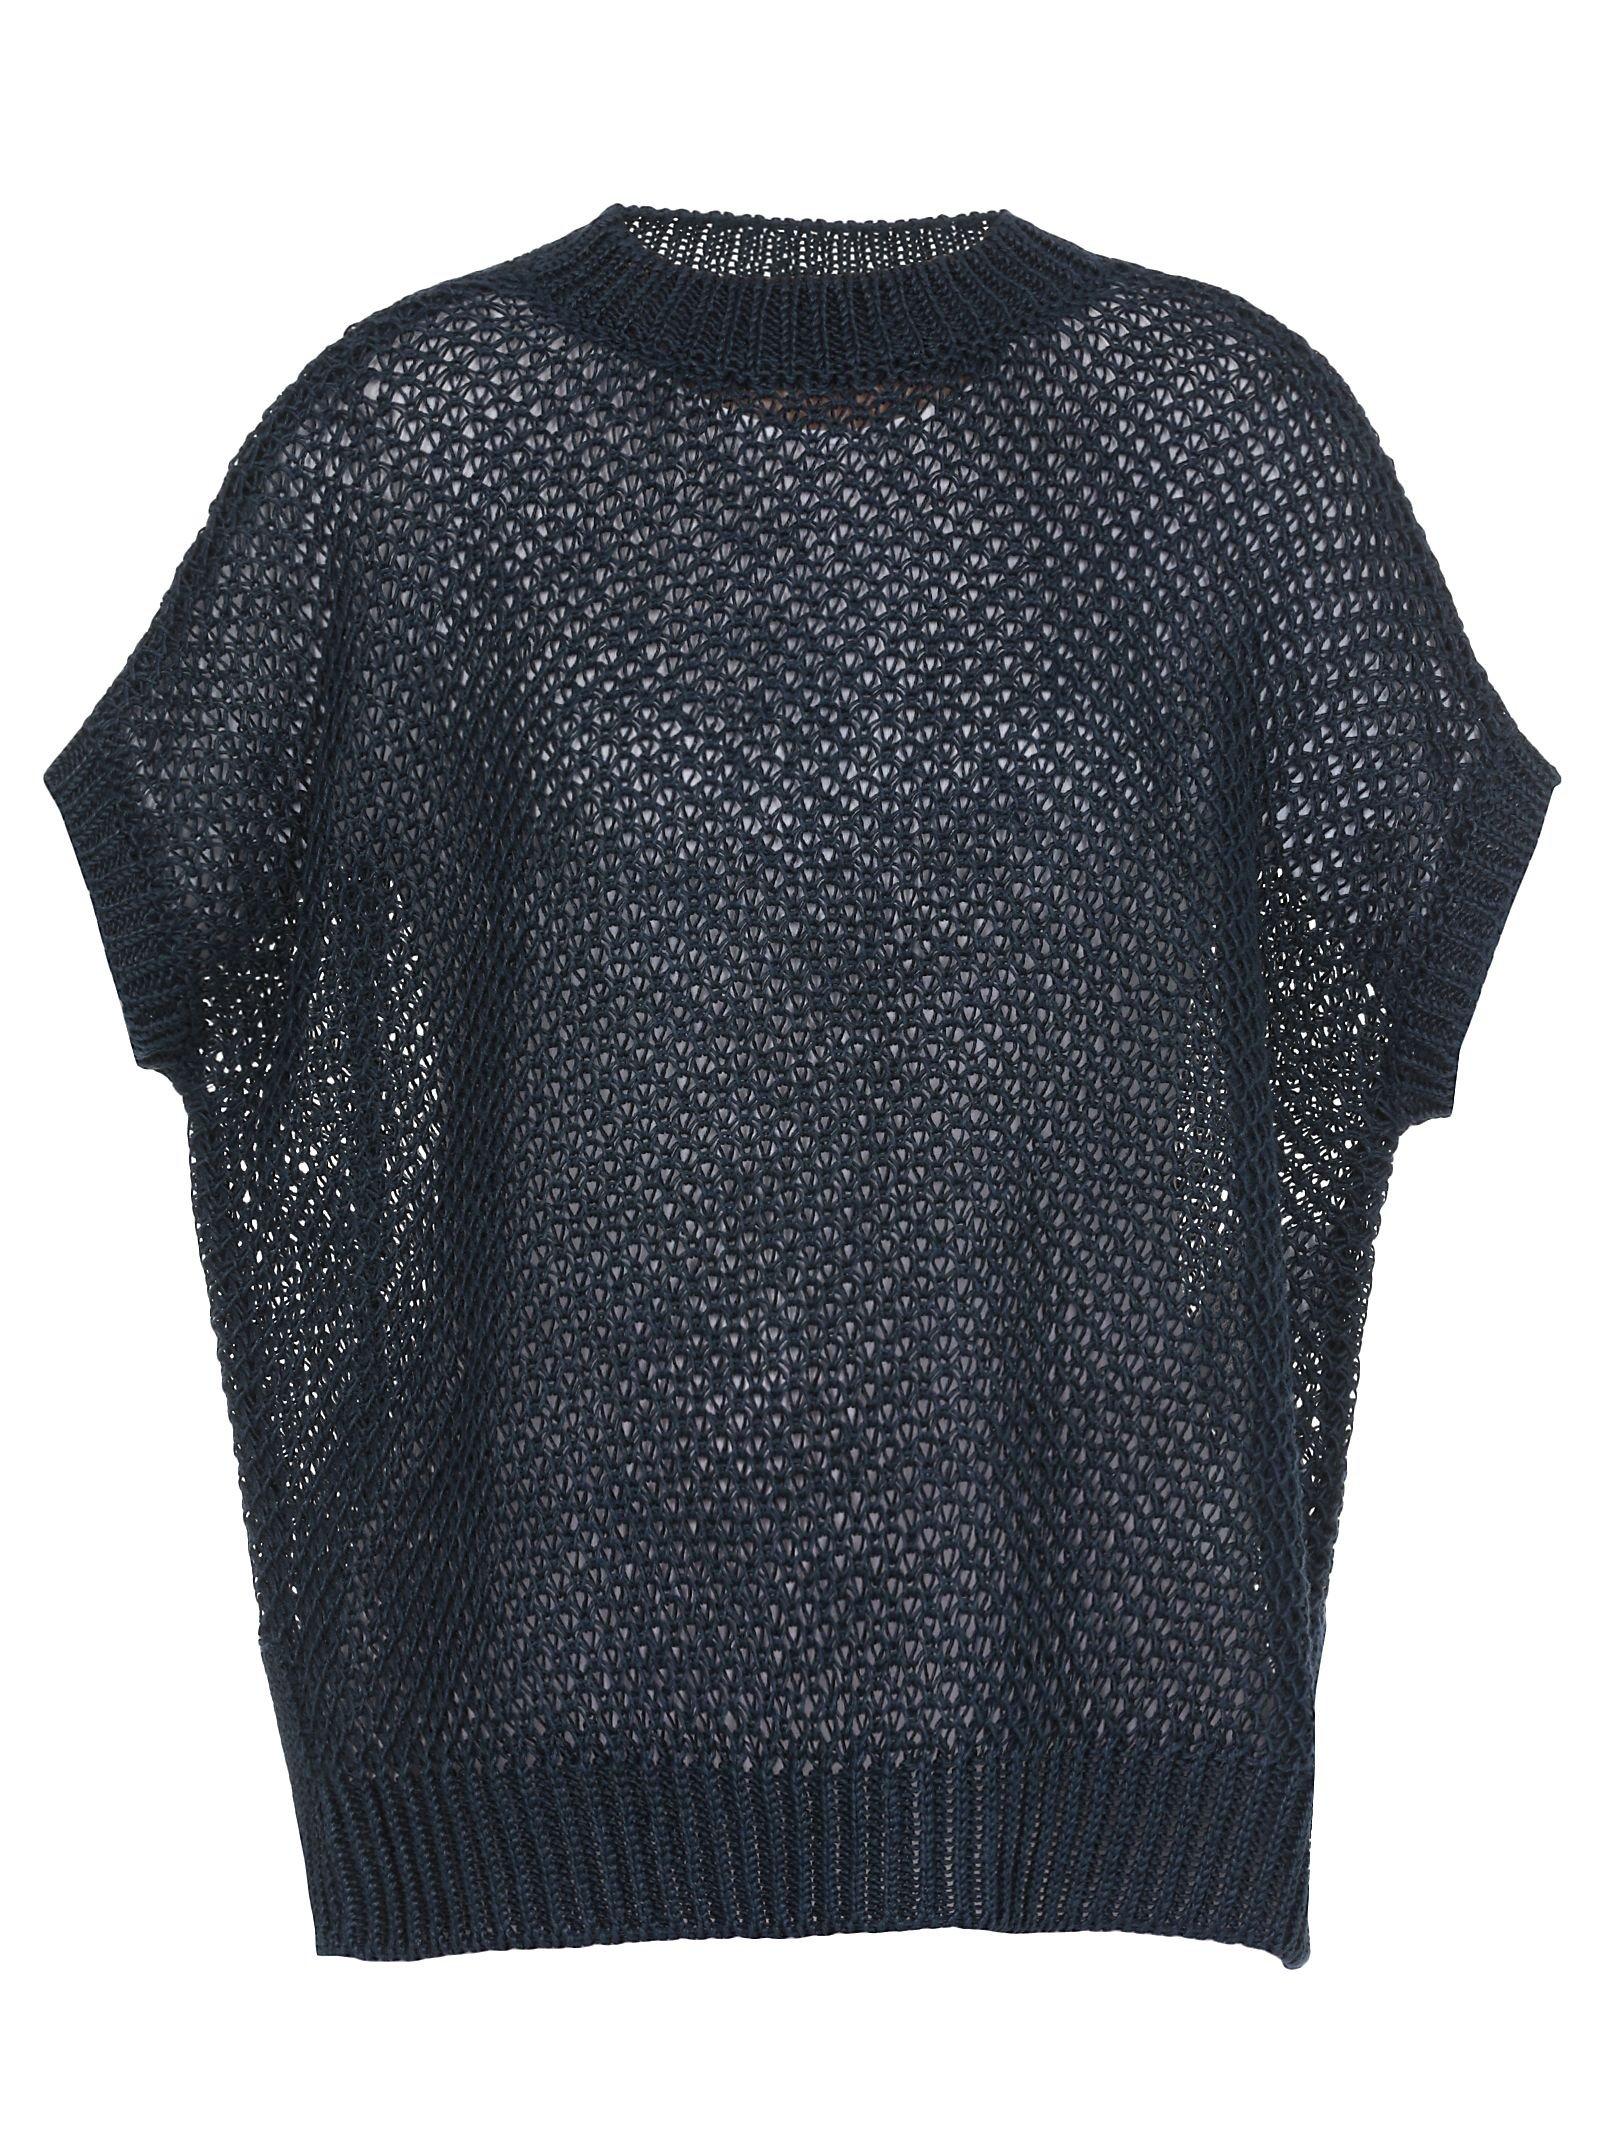 Max Mara Mach Sweater